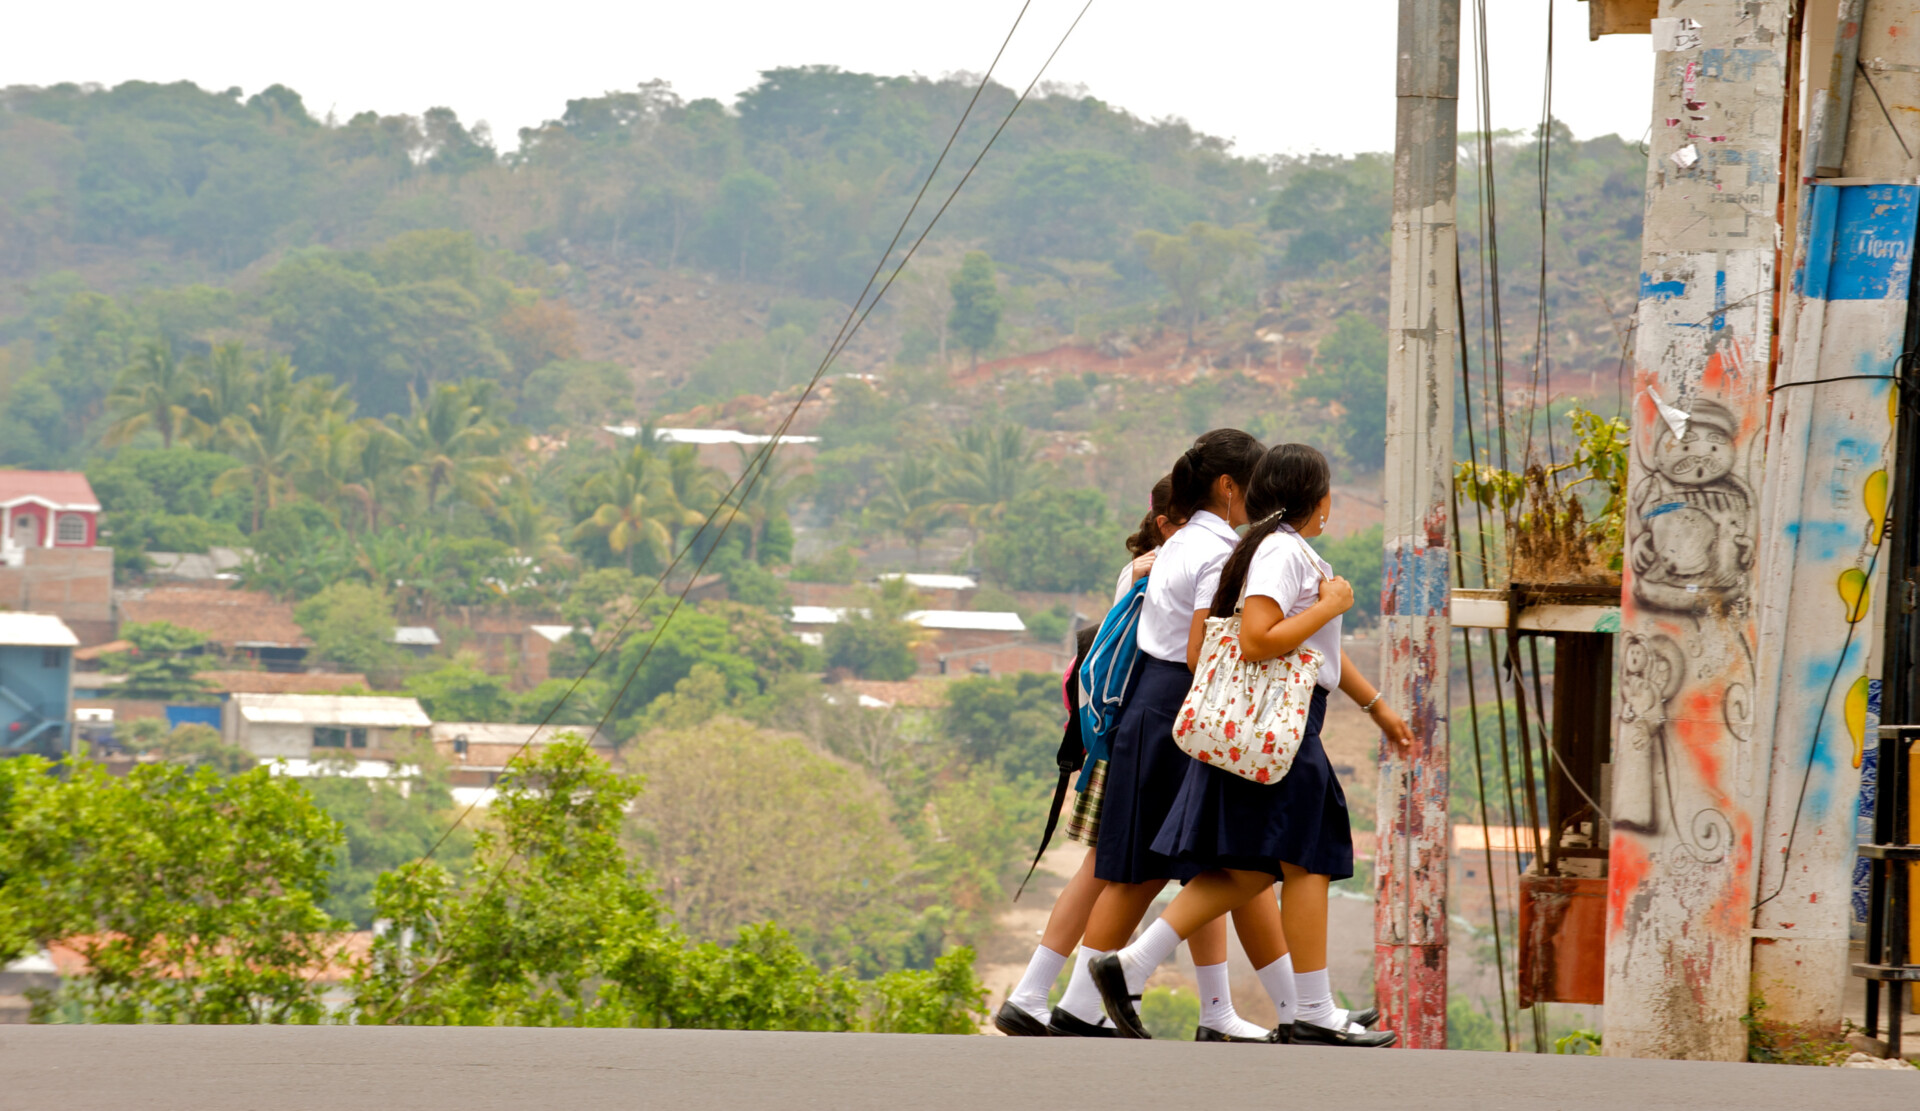 Three girls going to school in the town of San Rafael, El Salvado